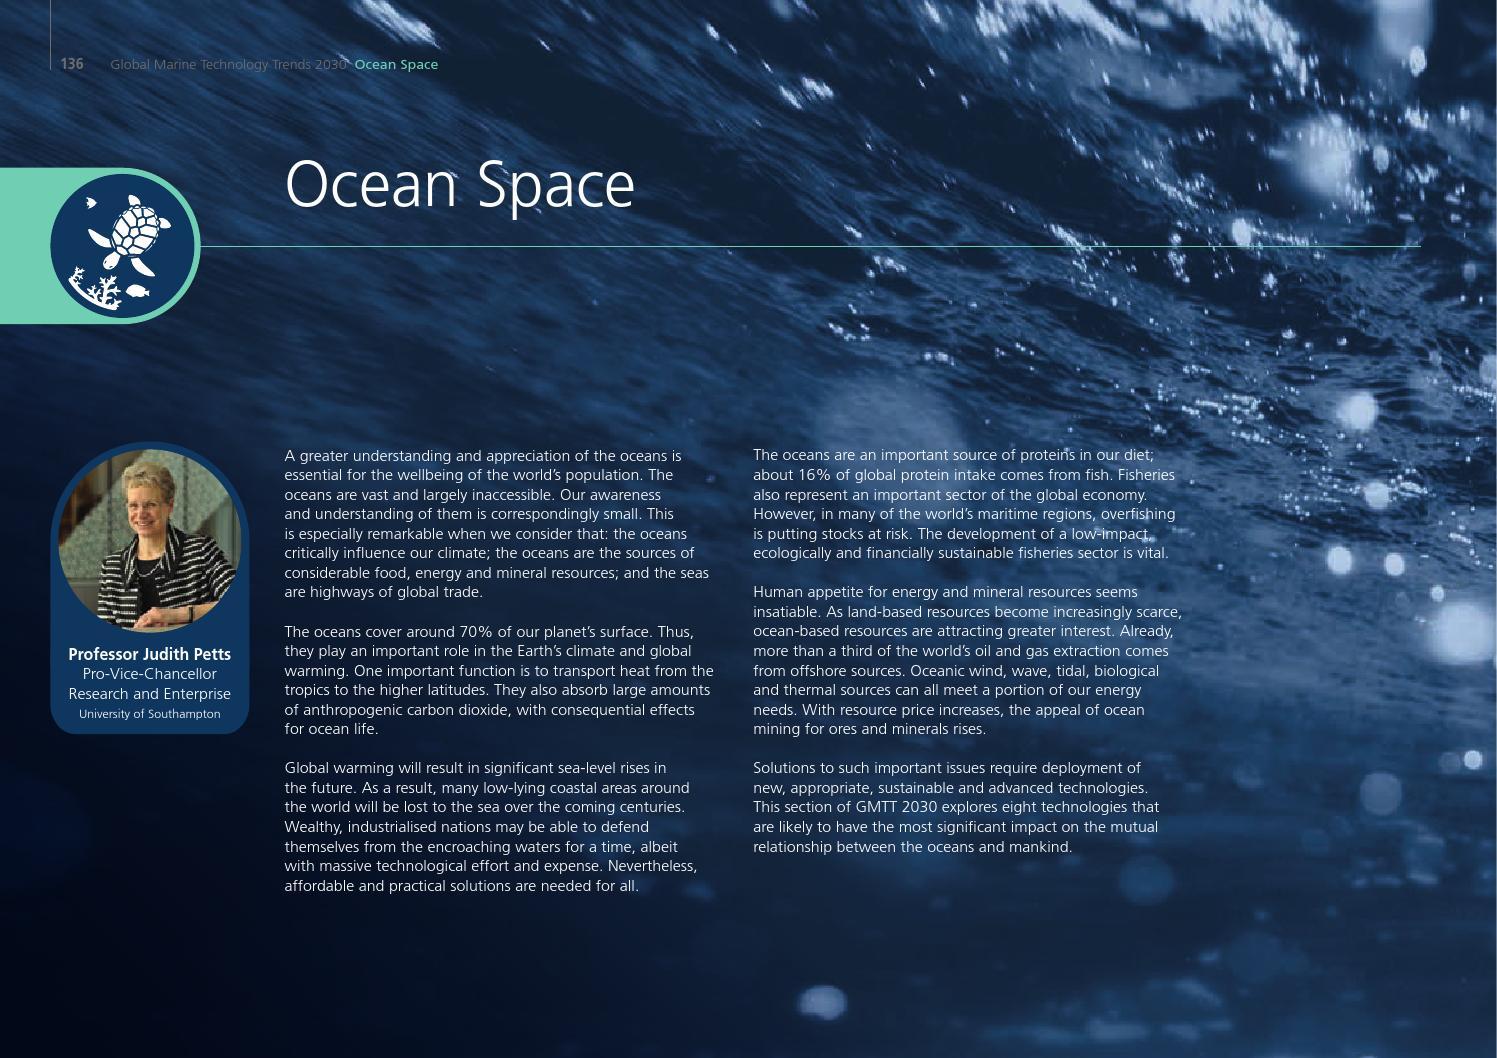 Global Marine Technology Trends 2030 by Lloyd's Register - issuu